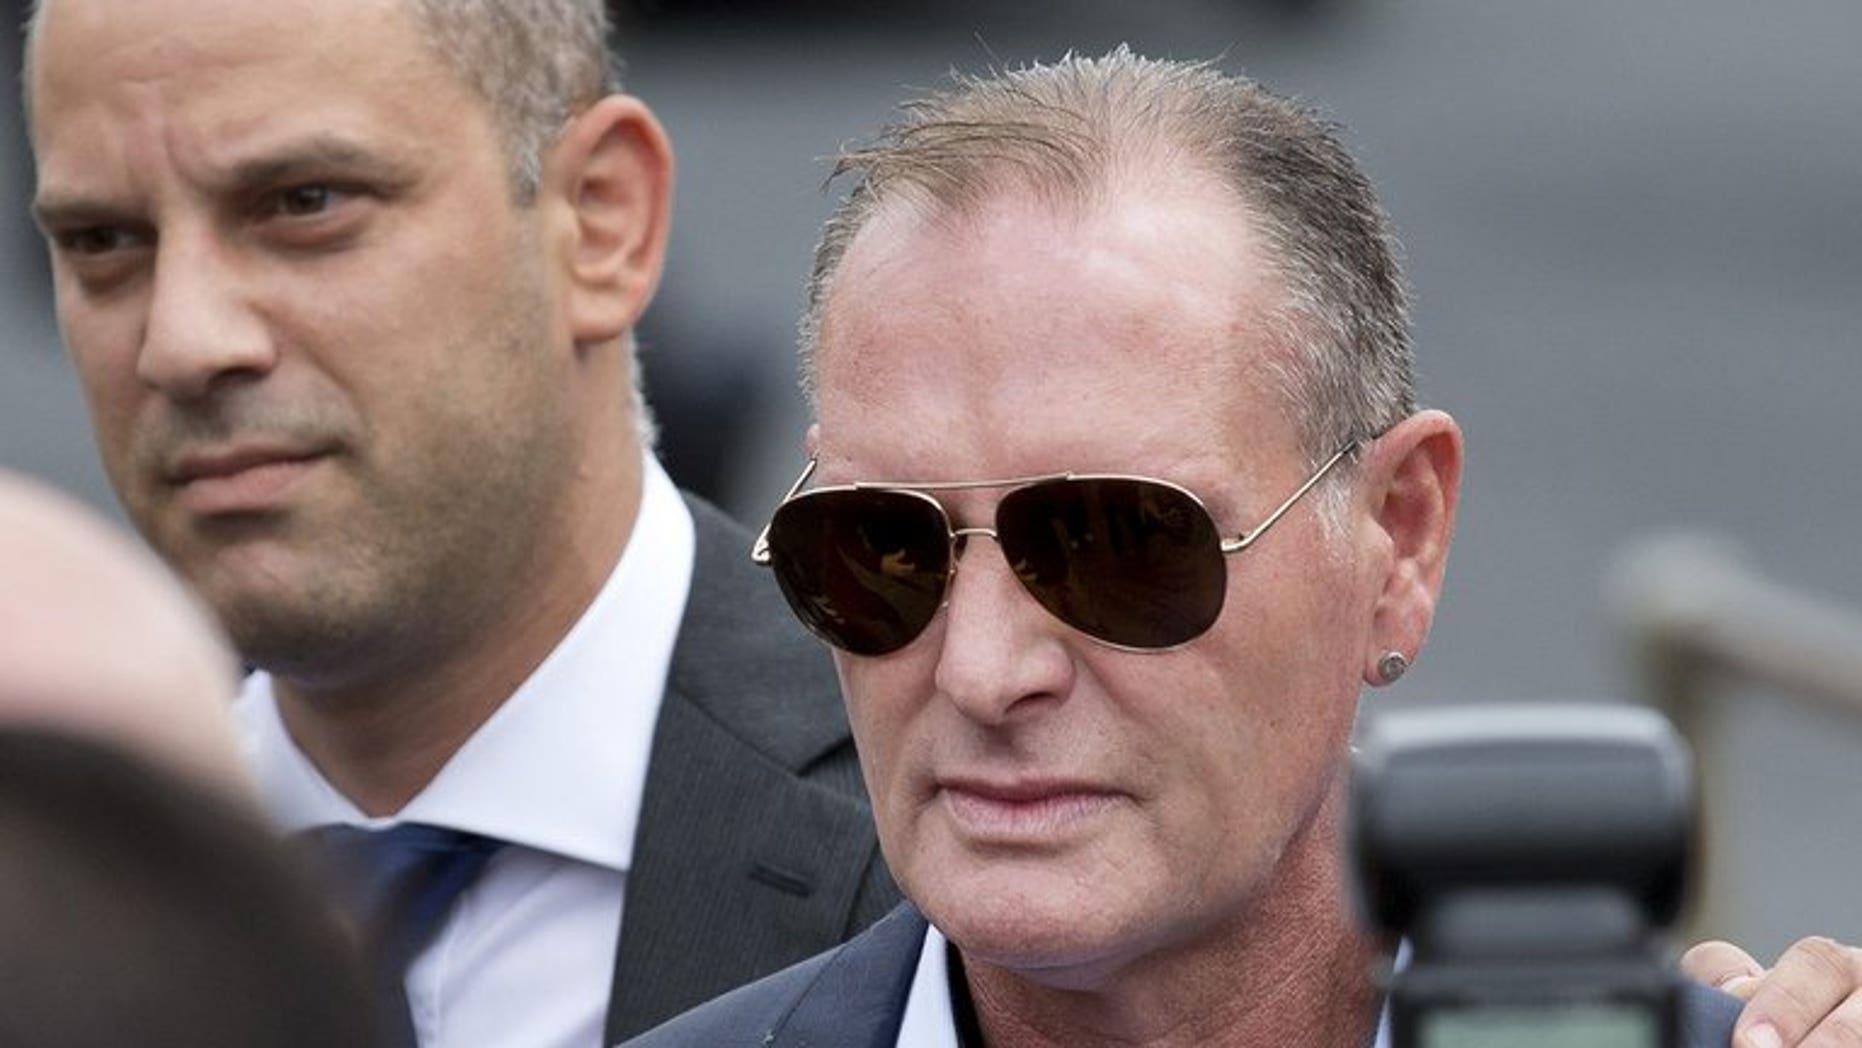 Former England footballer Paul Gascoigne arrives at Stevenage Magistrates Court, north of London, on August 5, 2013.